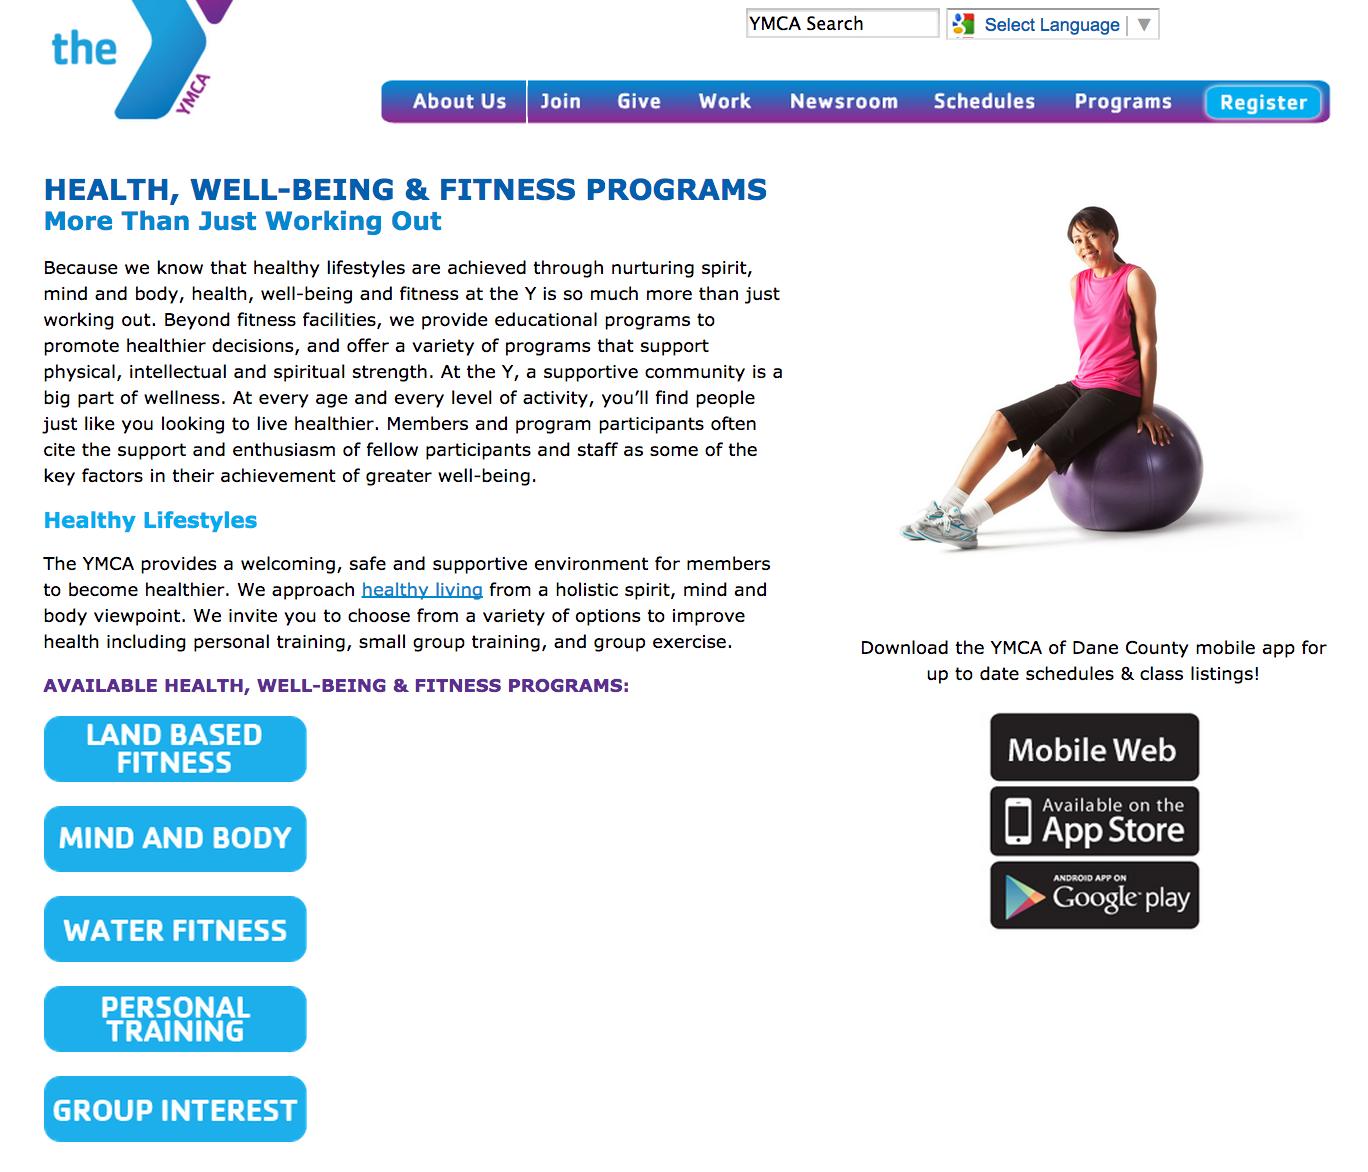 YMCA landing page